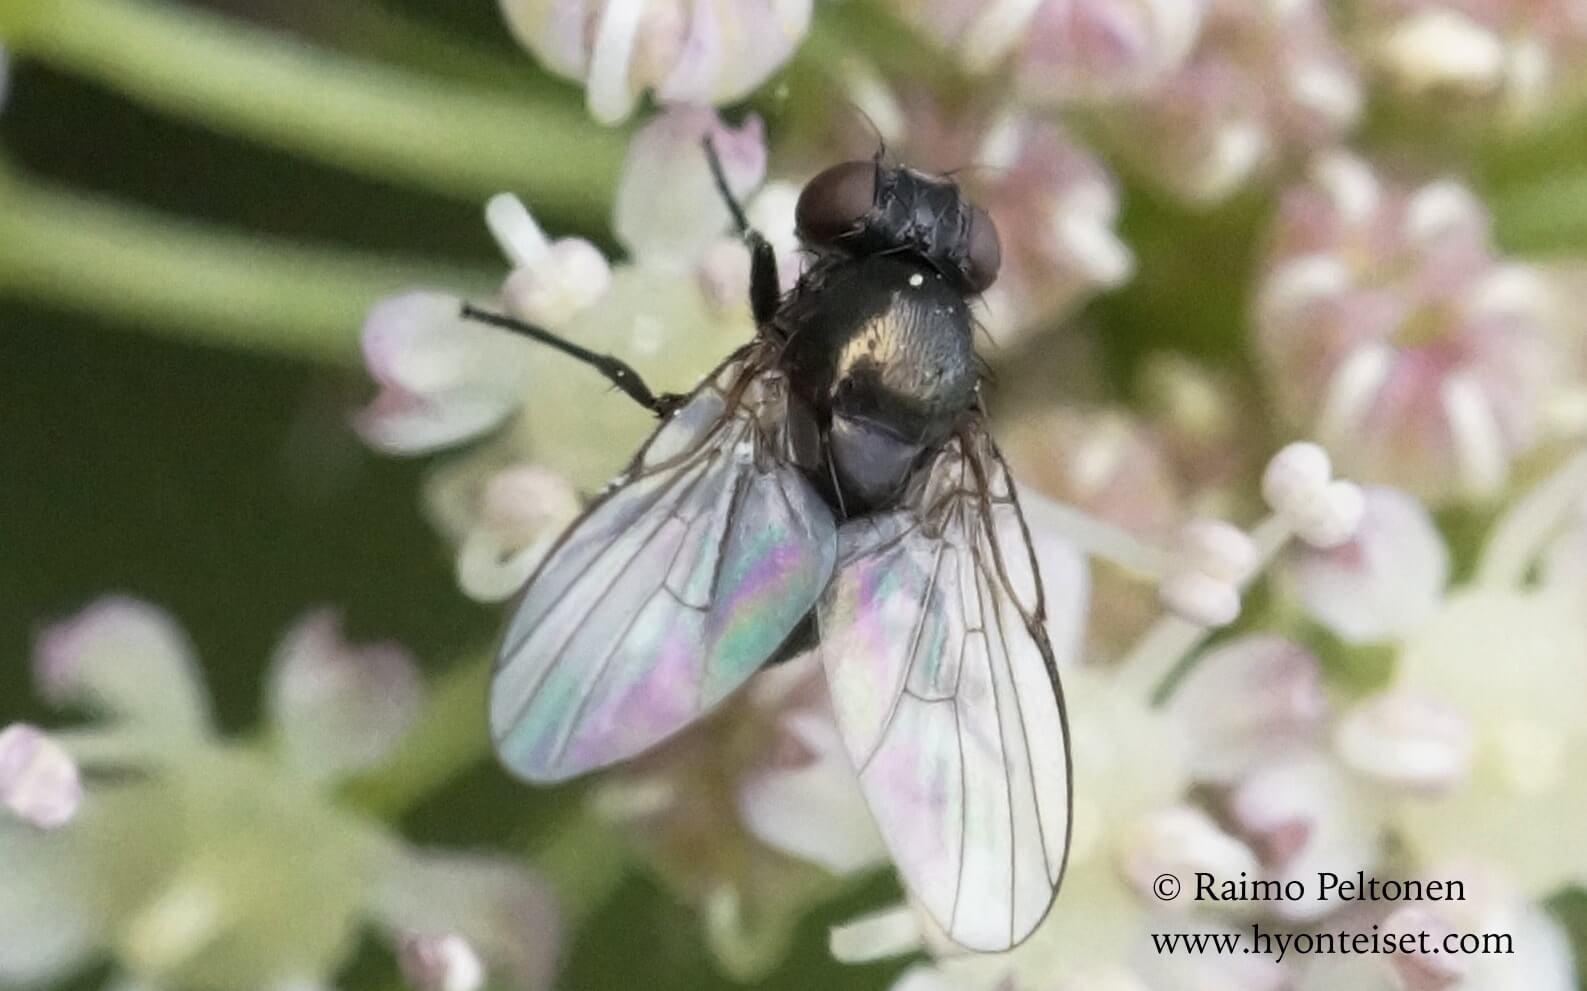 Melanagromyza sp. (det. Milos Cerny)